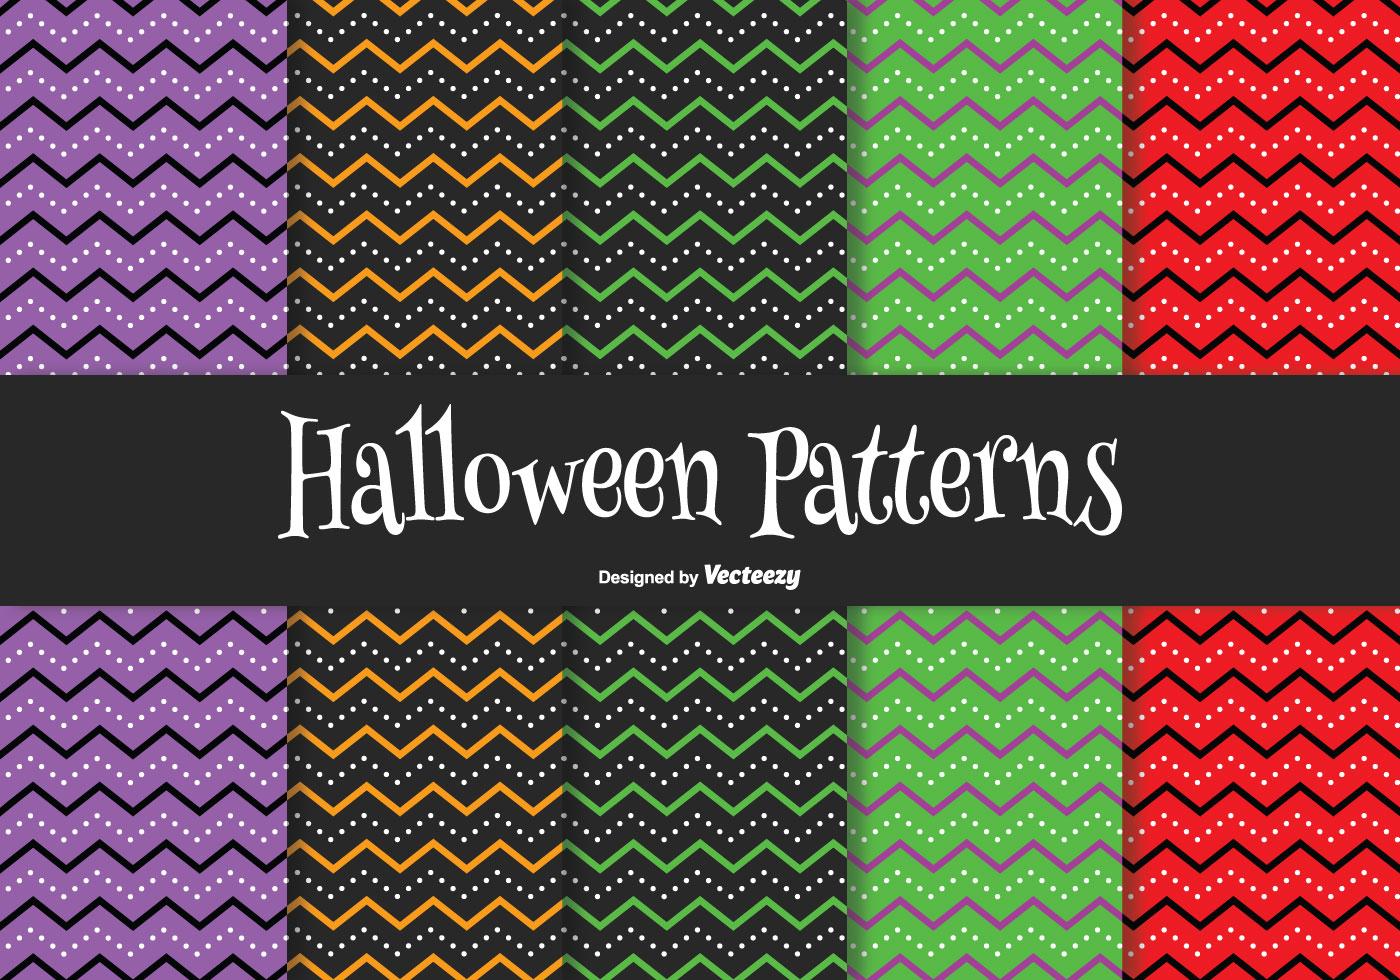 Black And White Dot Wallpaper Halloween Pattern Set Download Free Vector Art Stock